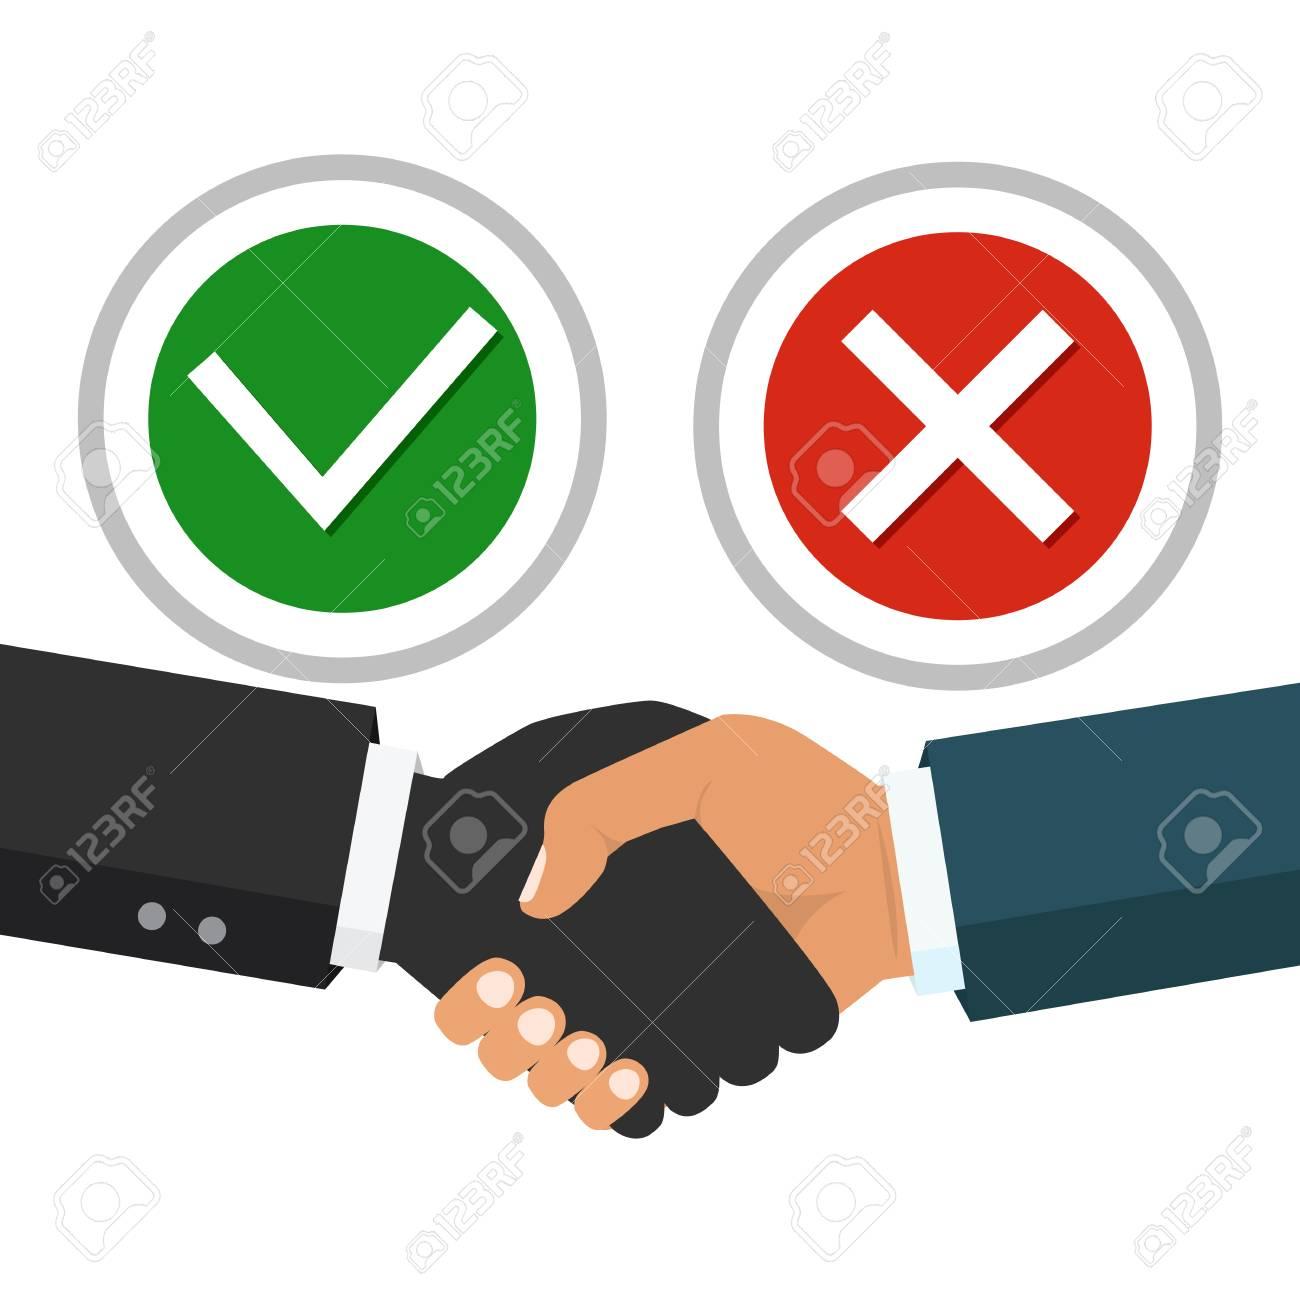 Vector Business Partnership Illustration Handshake Symbol Of